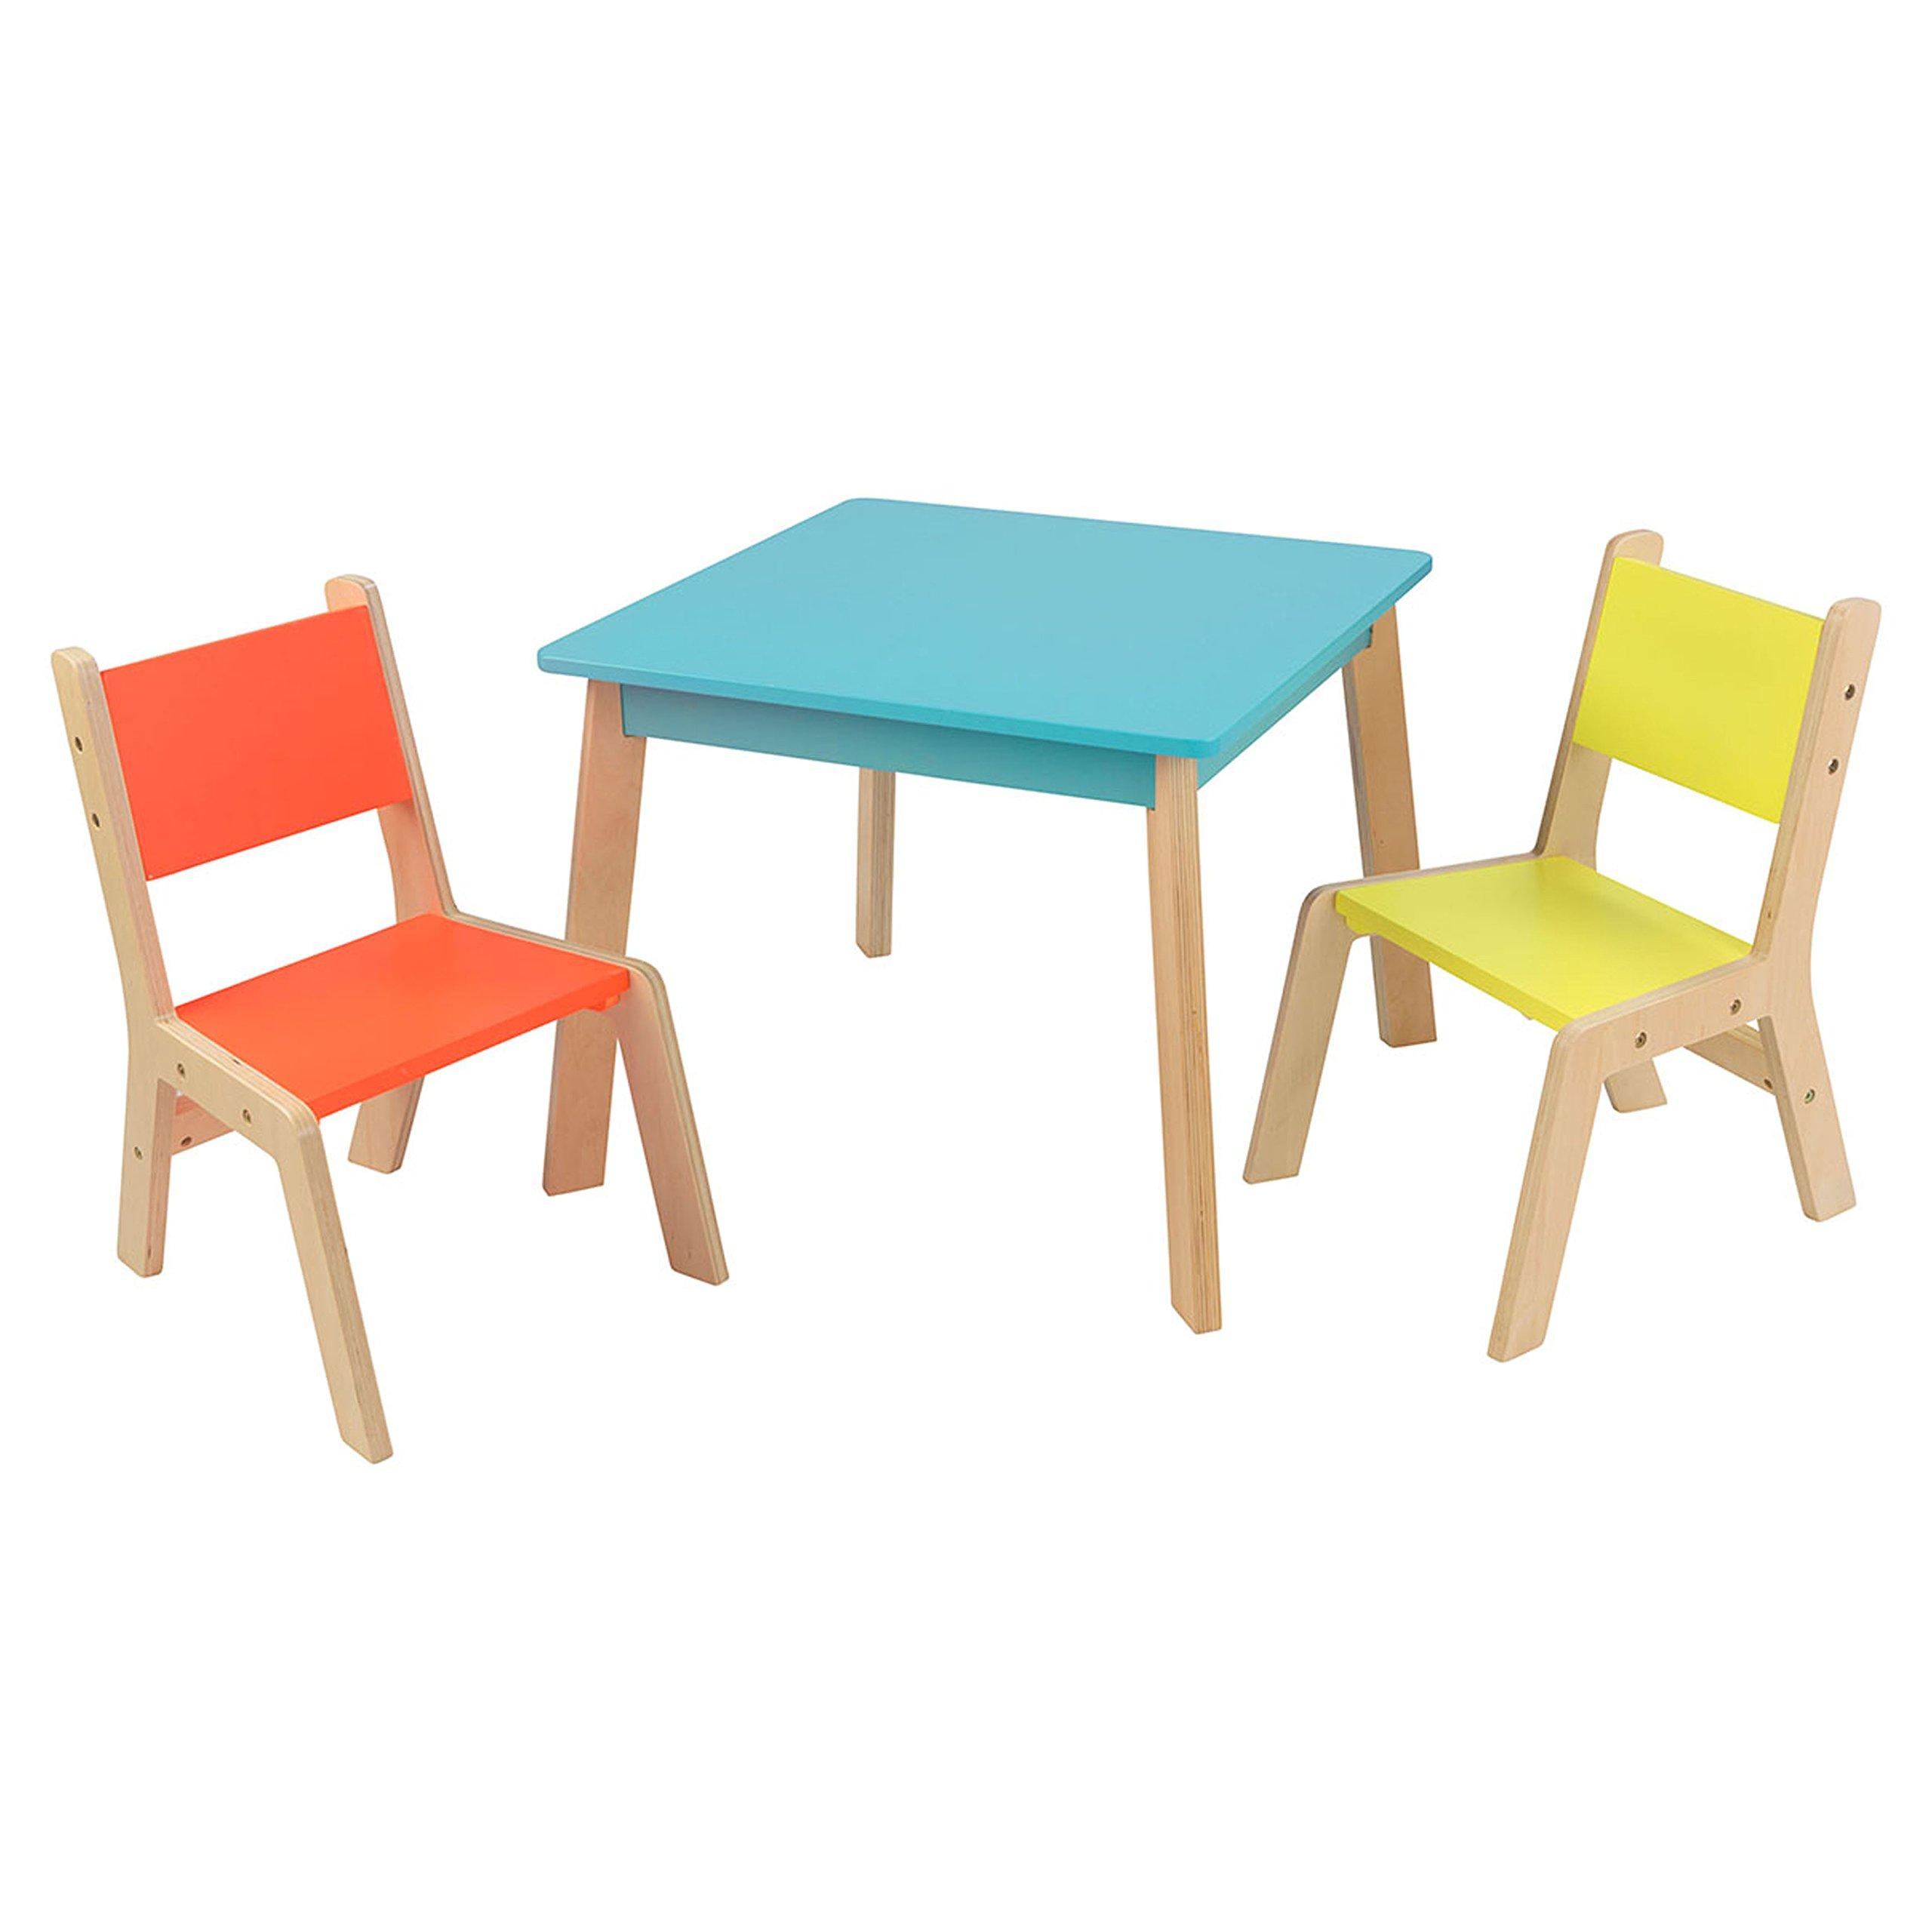 KidKraft Highlighter Modern Table & Chair Set by KidKraft